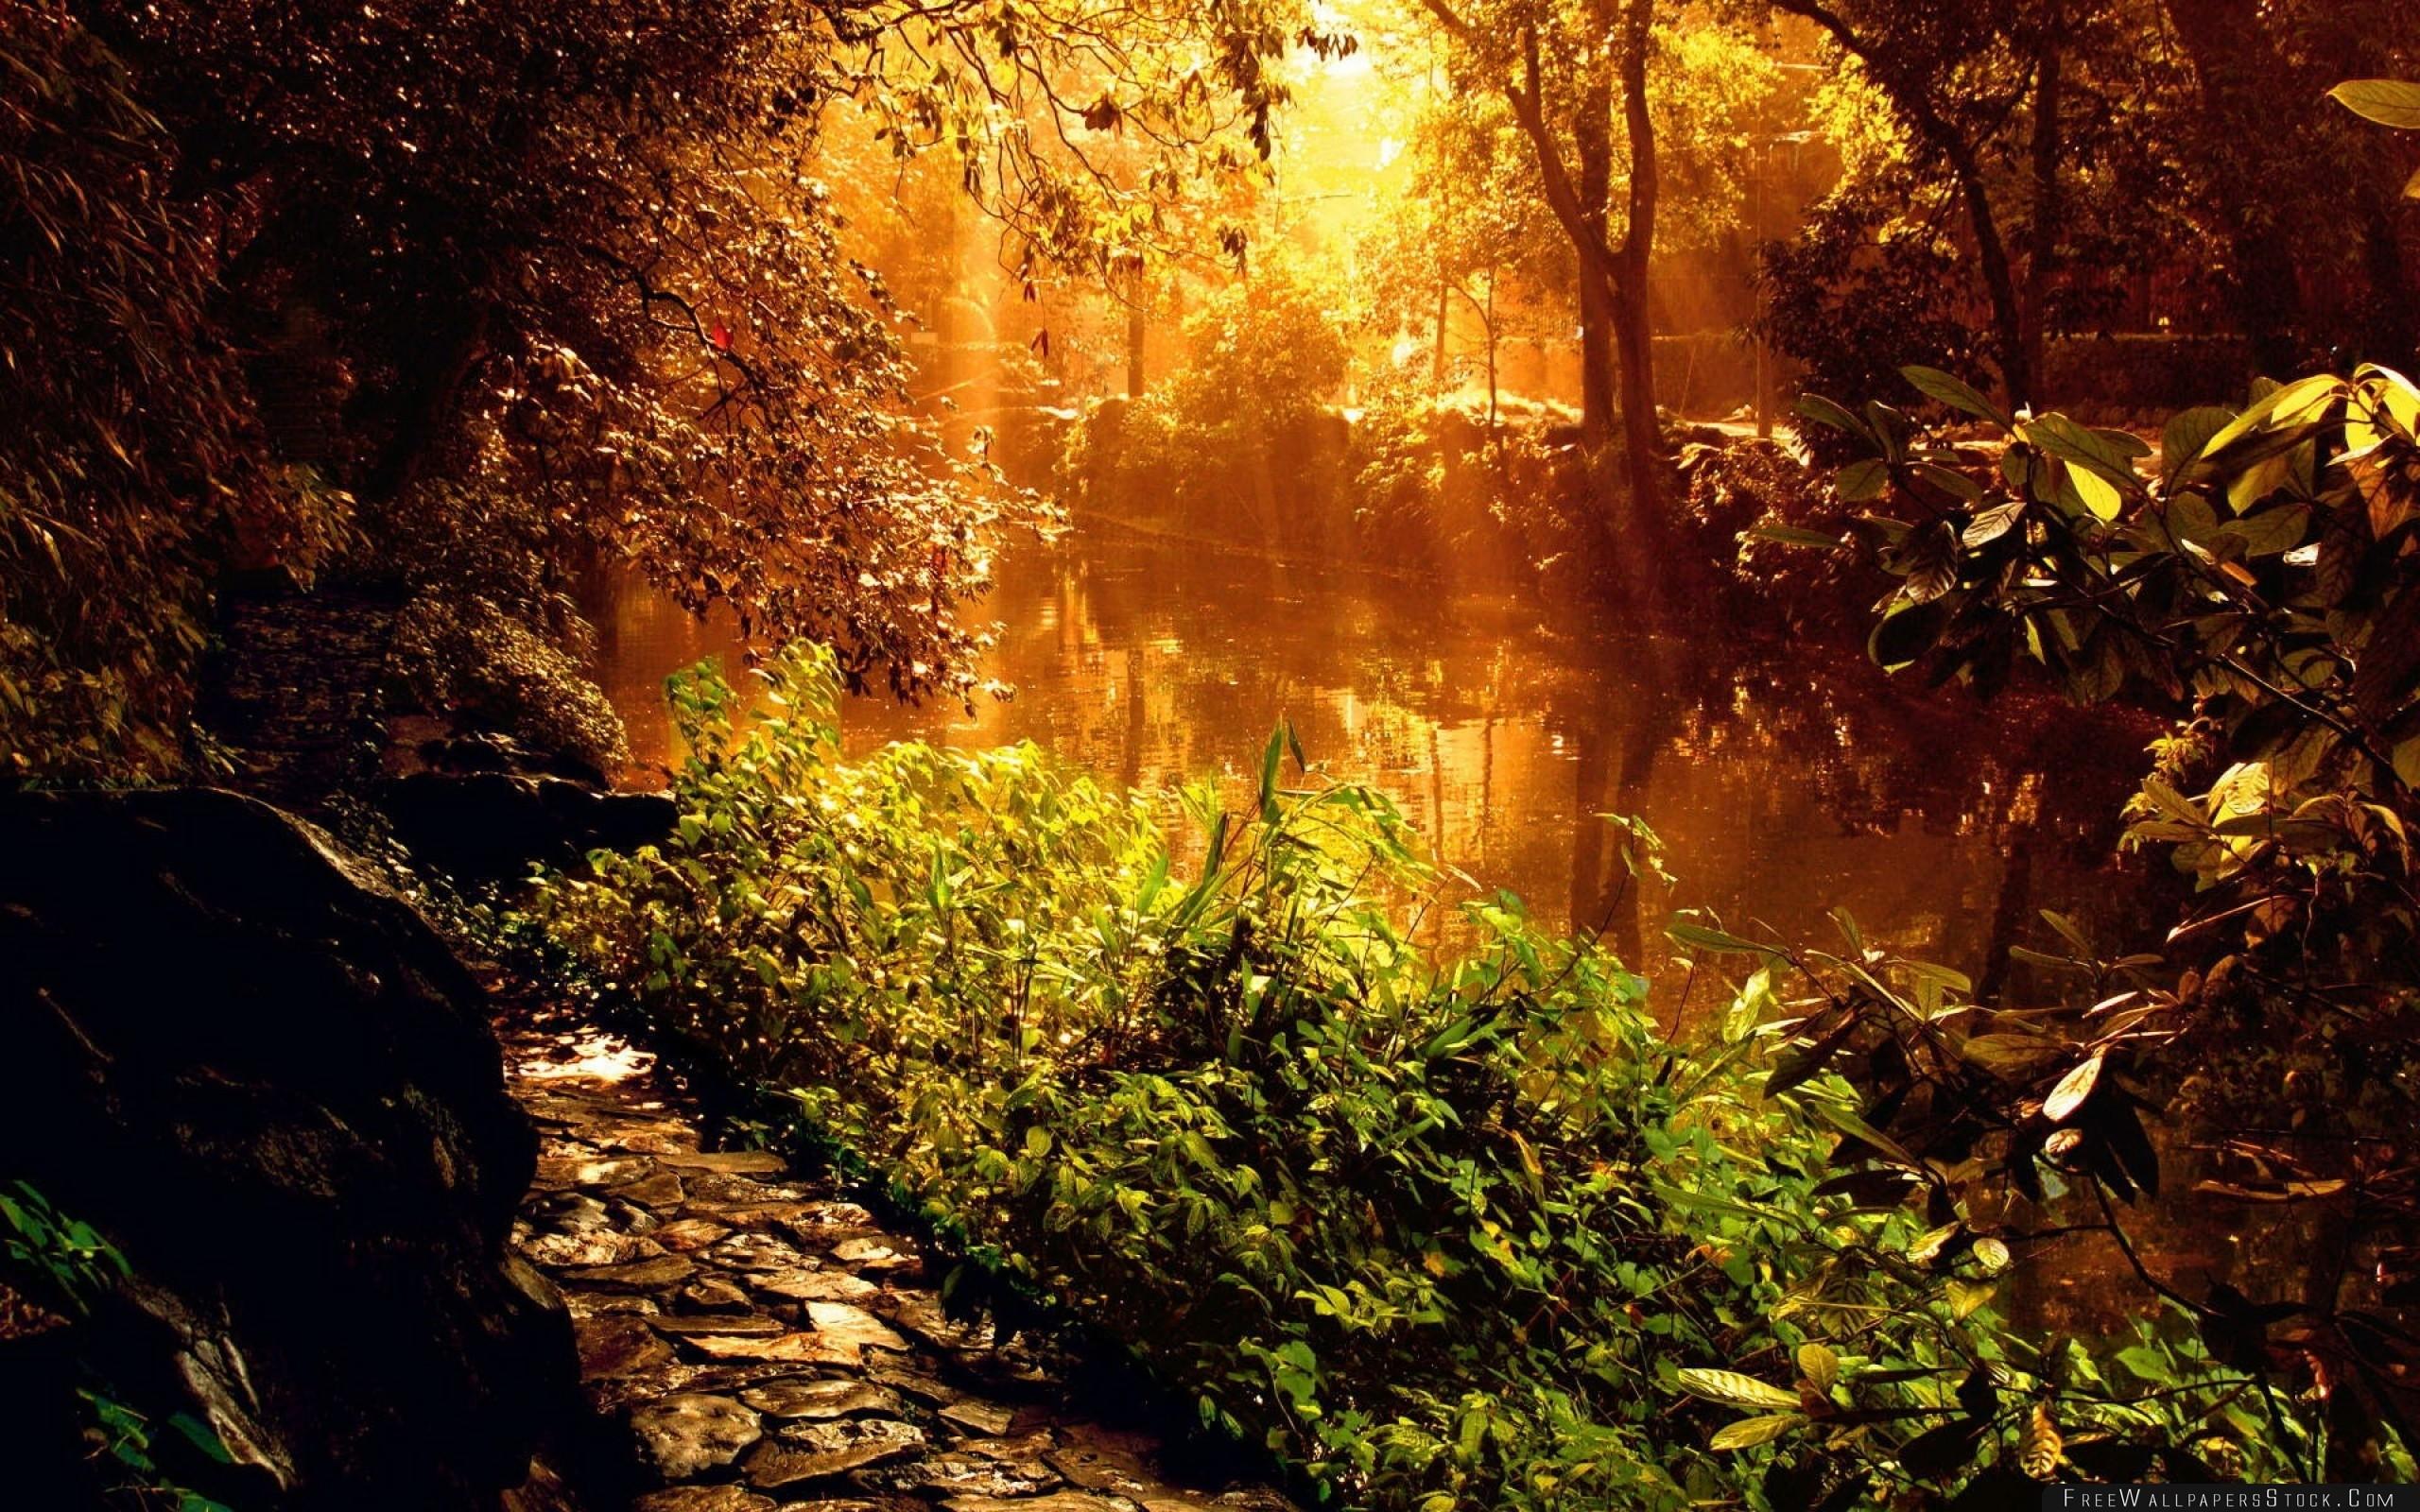 Download Free Wallpaper Wood Footpath Stones Sunlight Beams Trees Vegetation